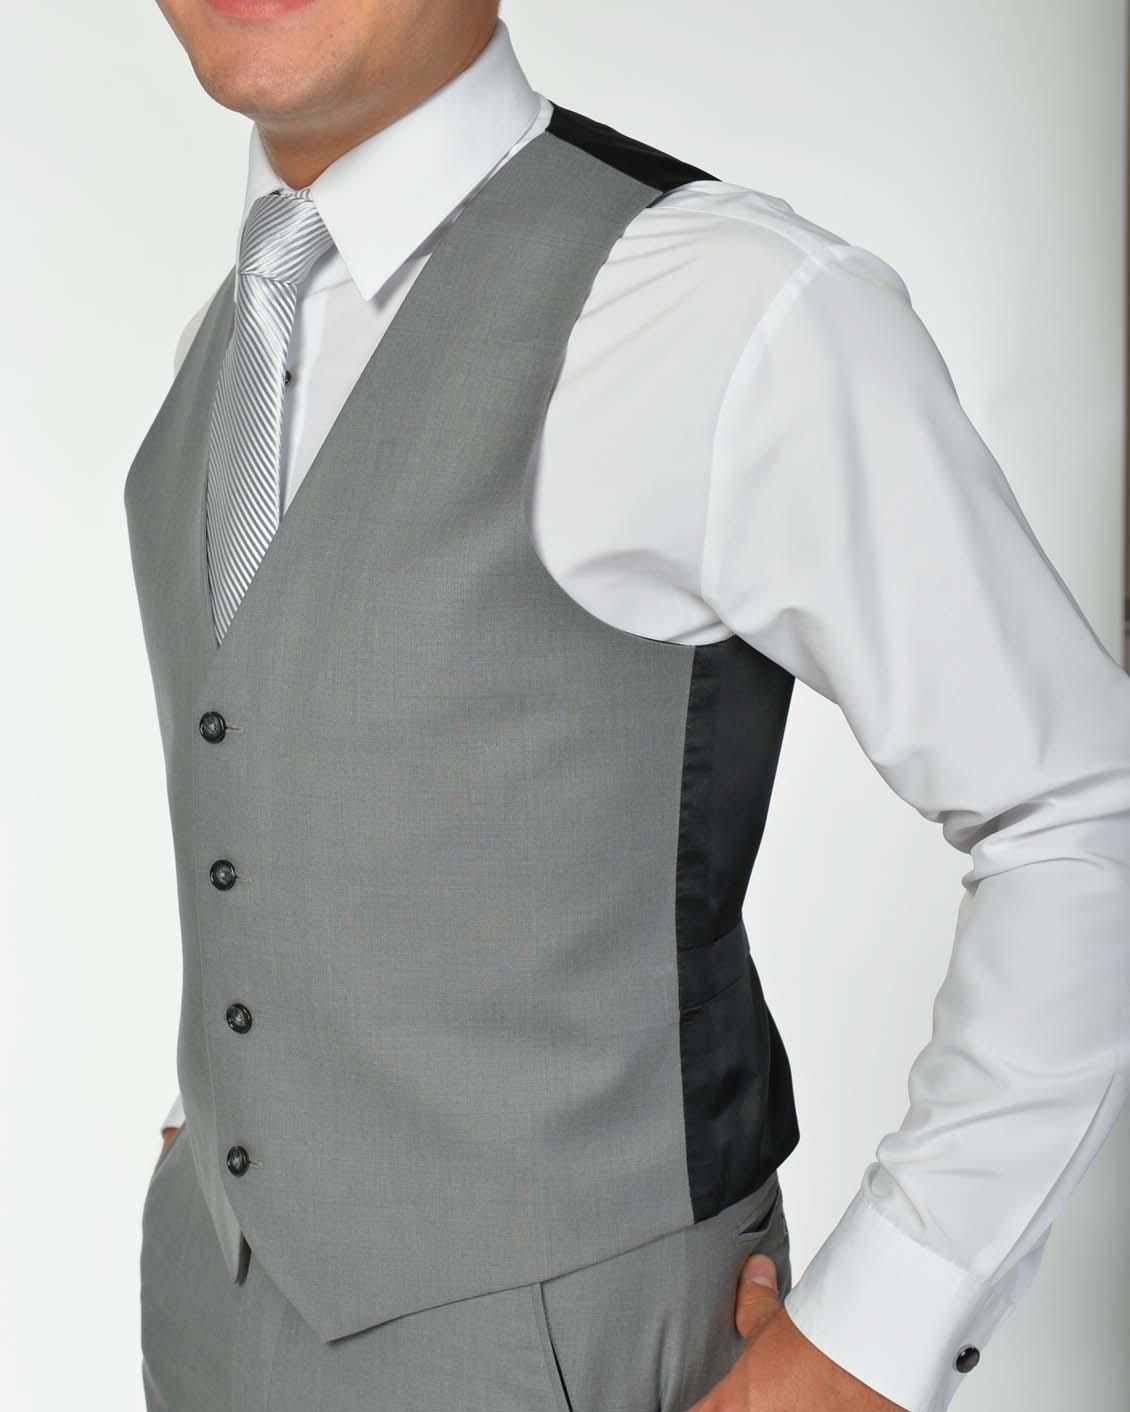 Tuxedo.ca - Light Grey Vest